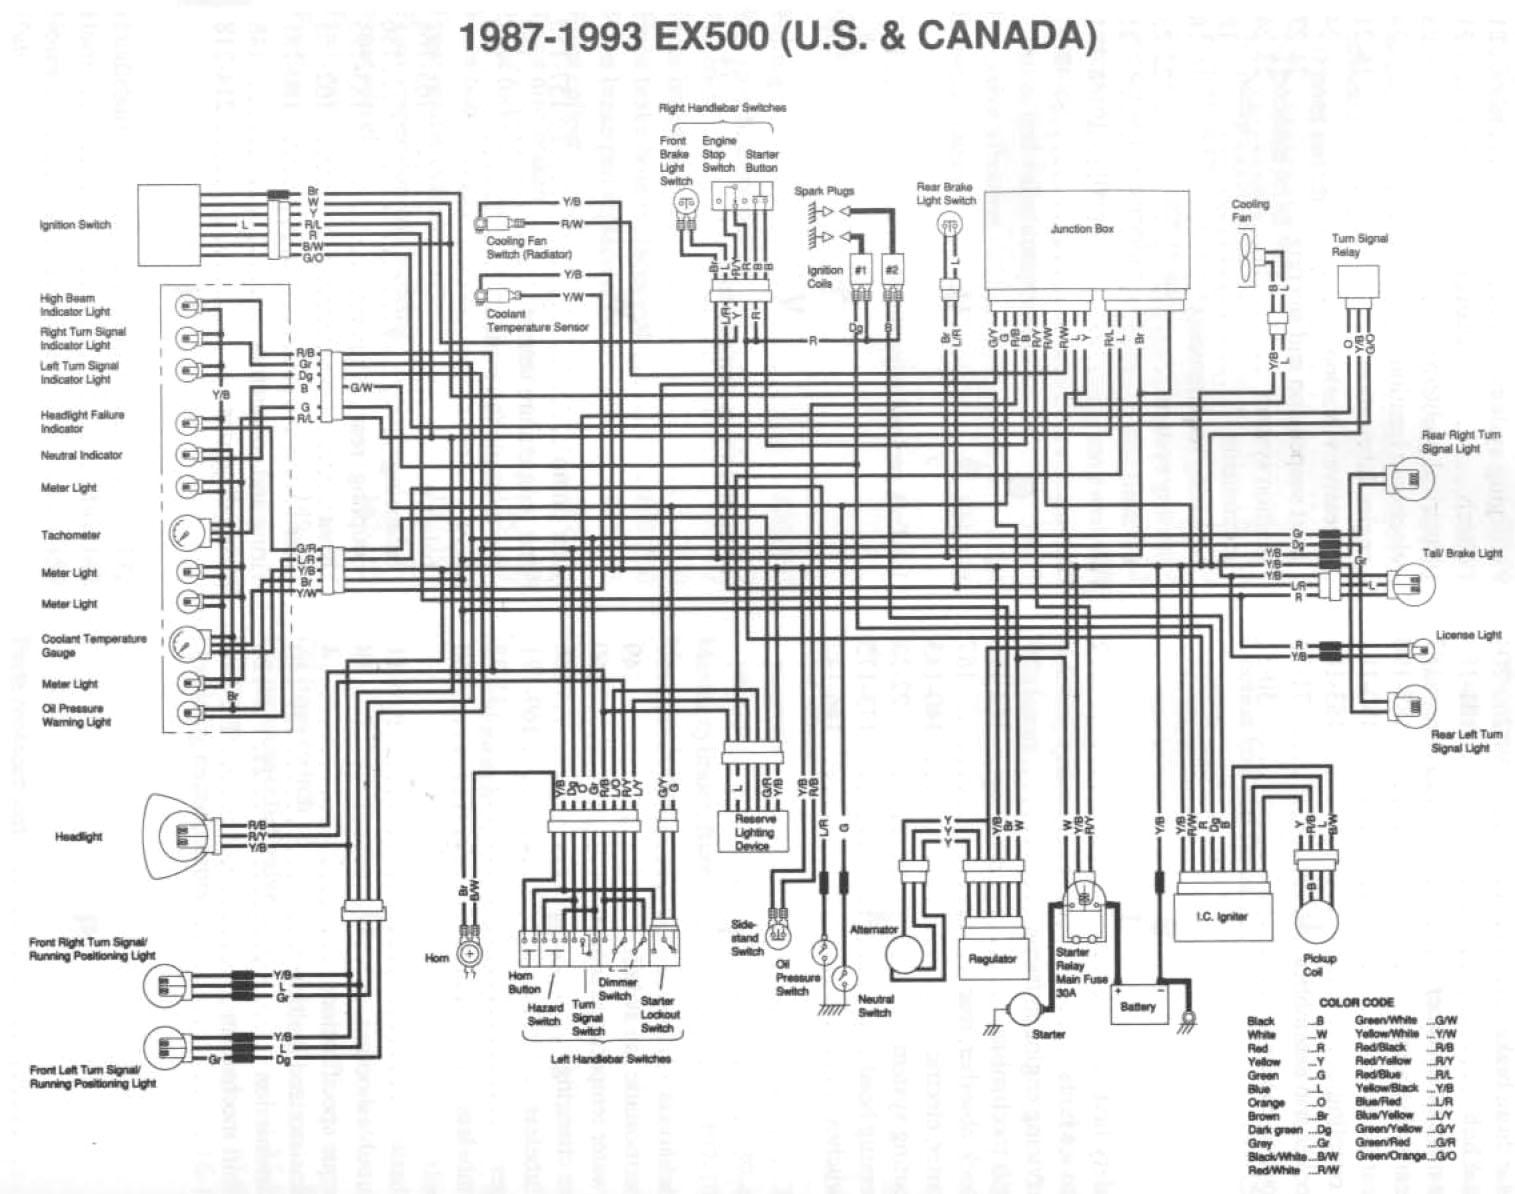 scotts s2048 wiring diagram scotts 1742g wiring diagram wiring library  scotts 1742g wiring diagram wiring